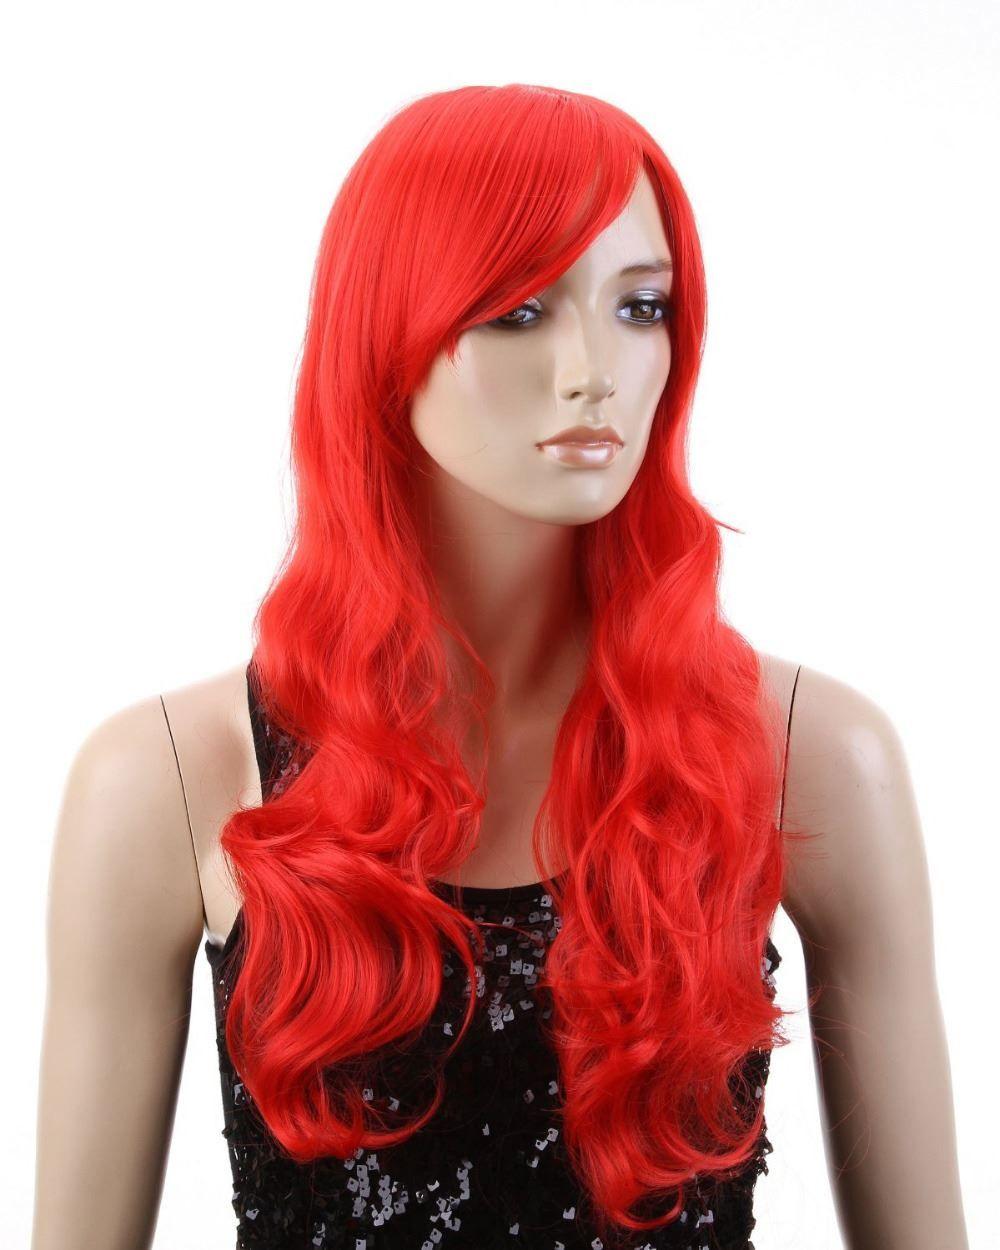 Großhandel Hair Sw Cosplay Jessica Kaninchen Frisur Inspiriert